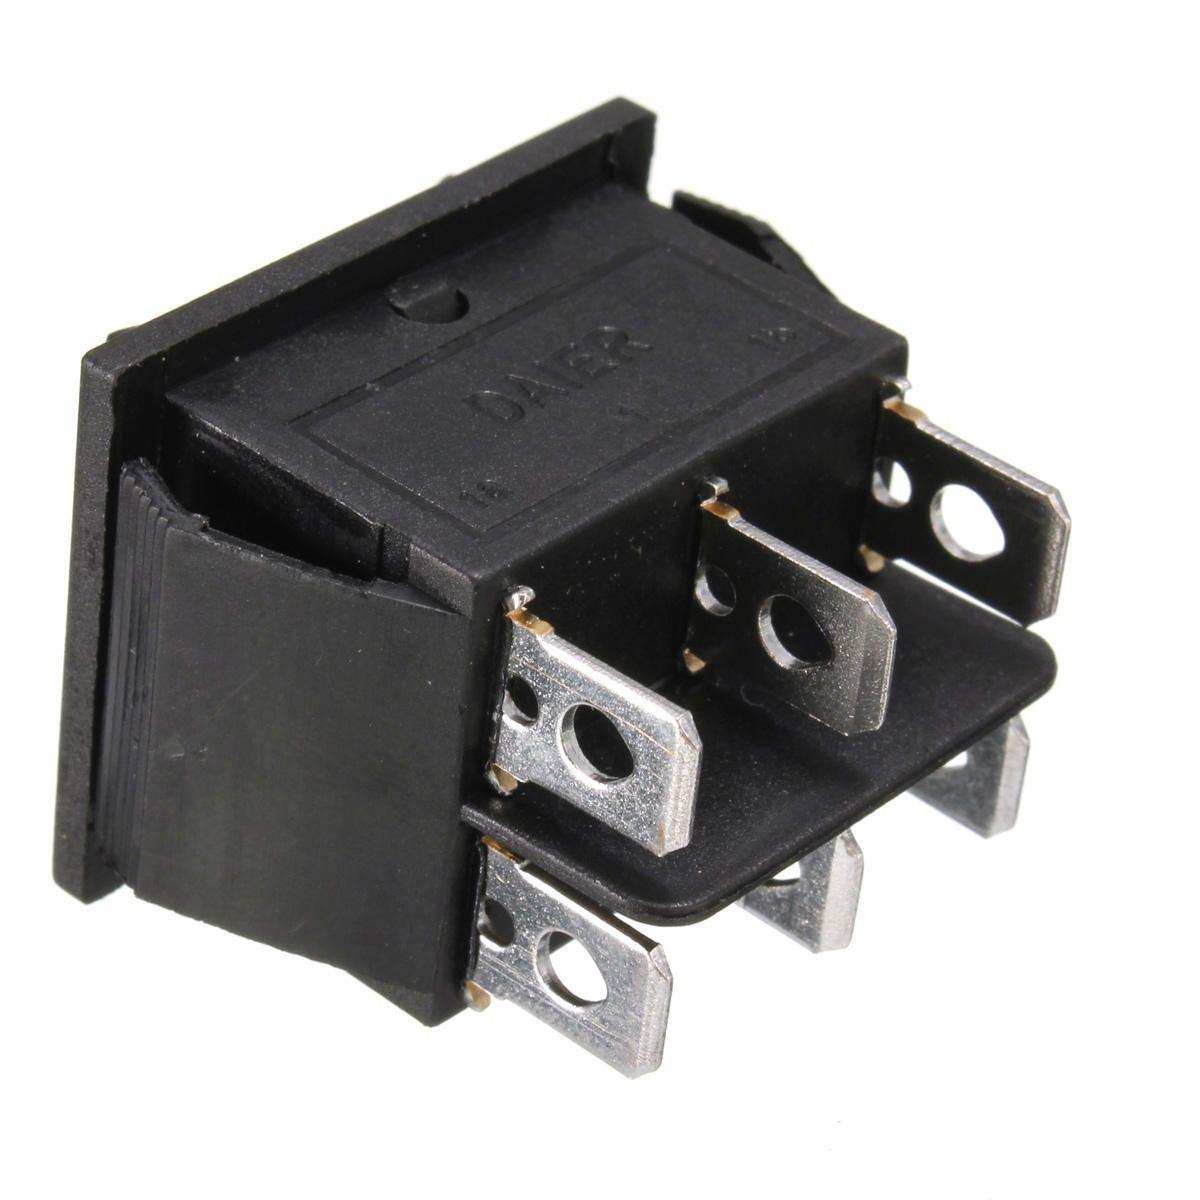 UMJ US$2.13 12 Volt 6-Pin DPDT Power Window Momentary Rocker Switch AC 250V/10A 125V/15A